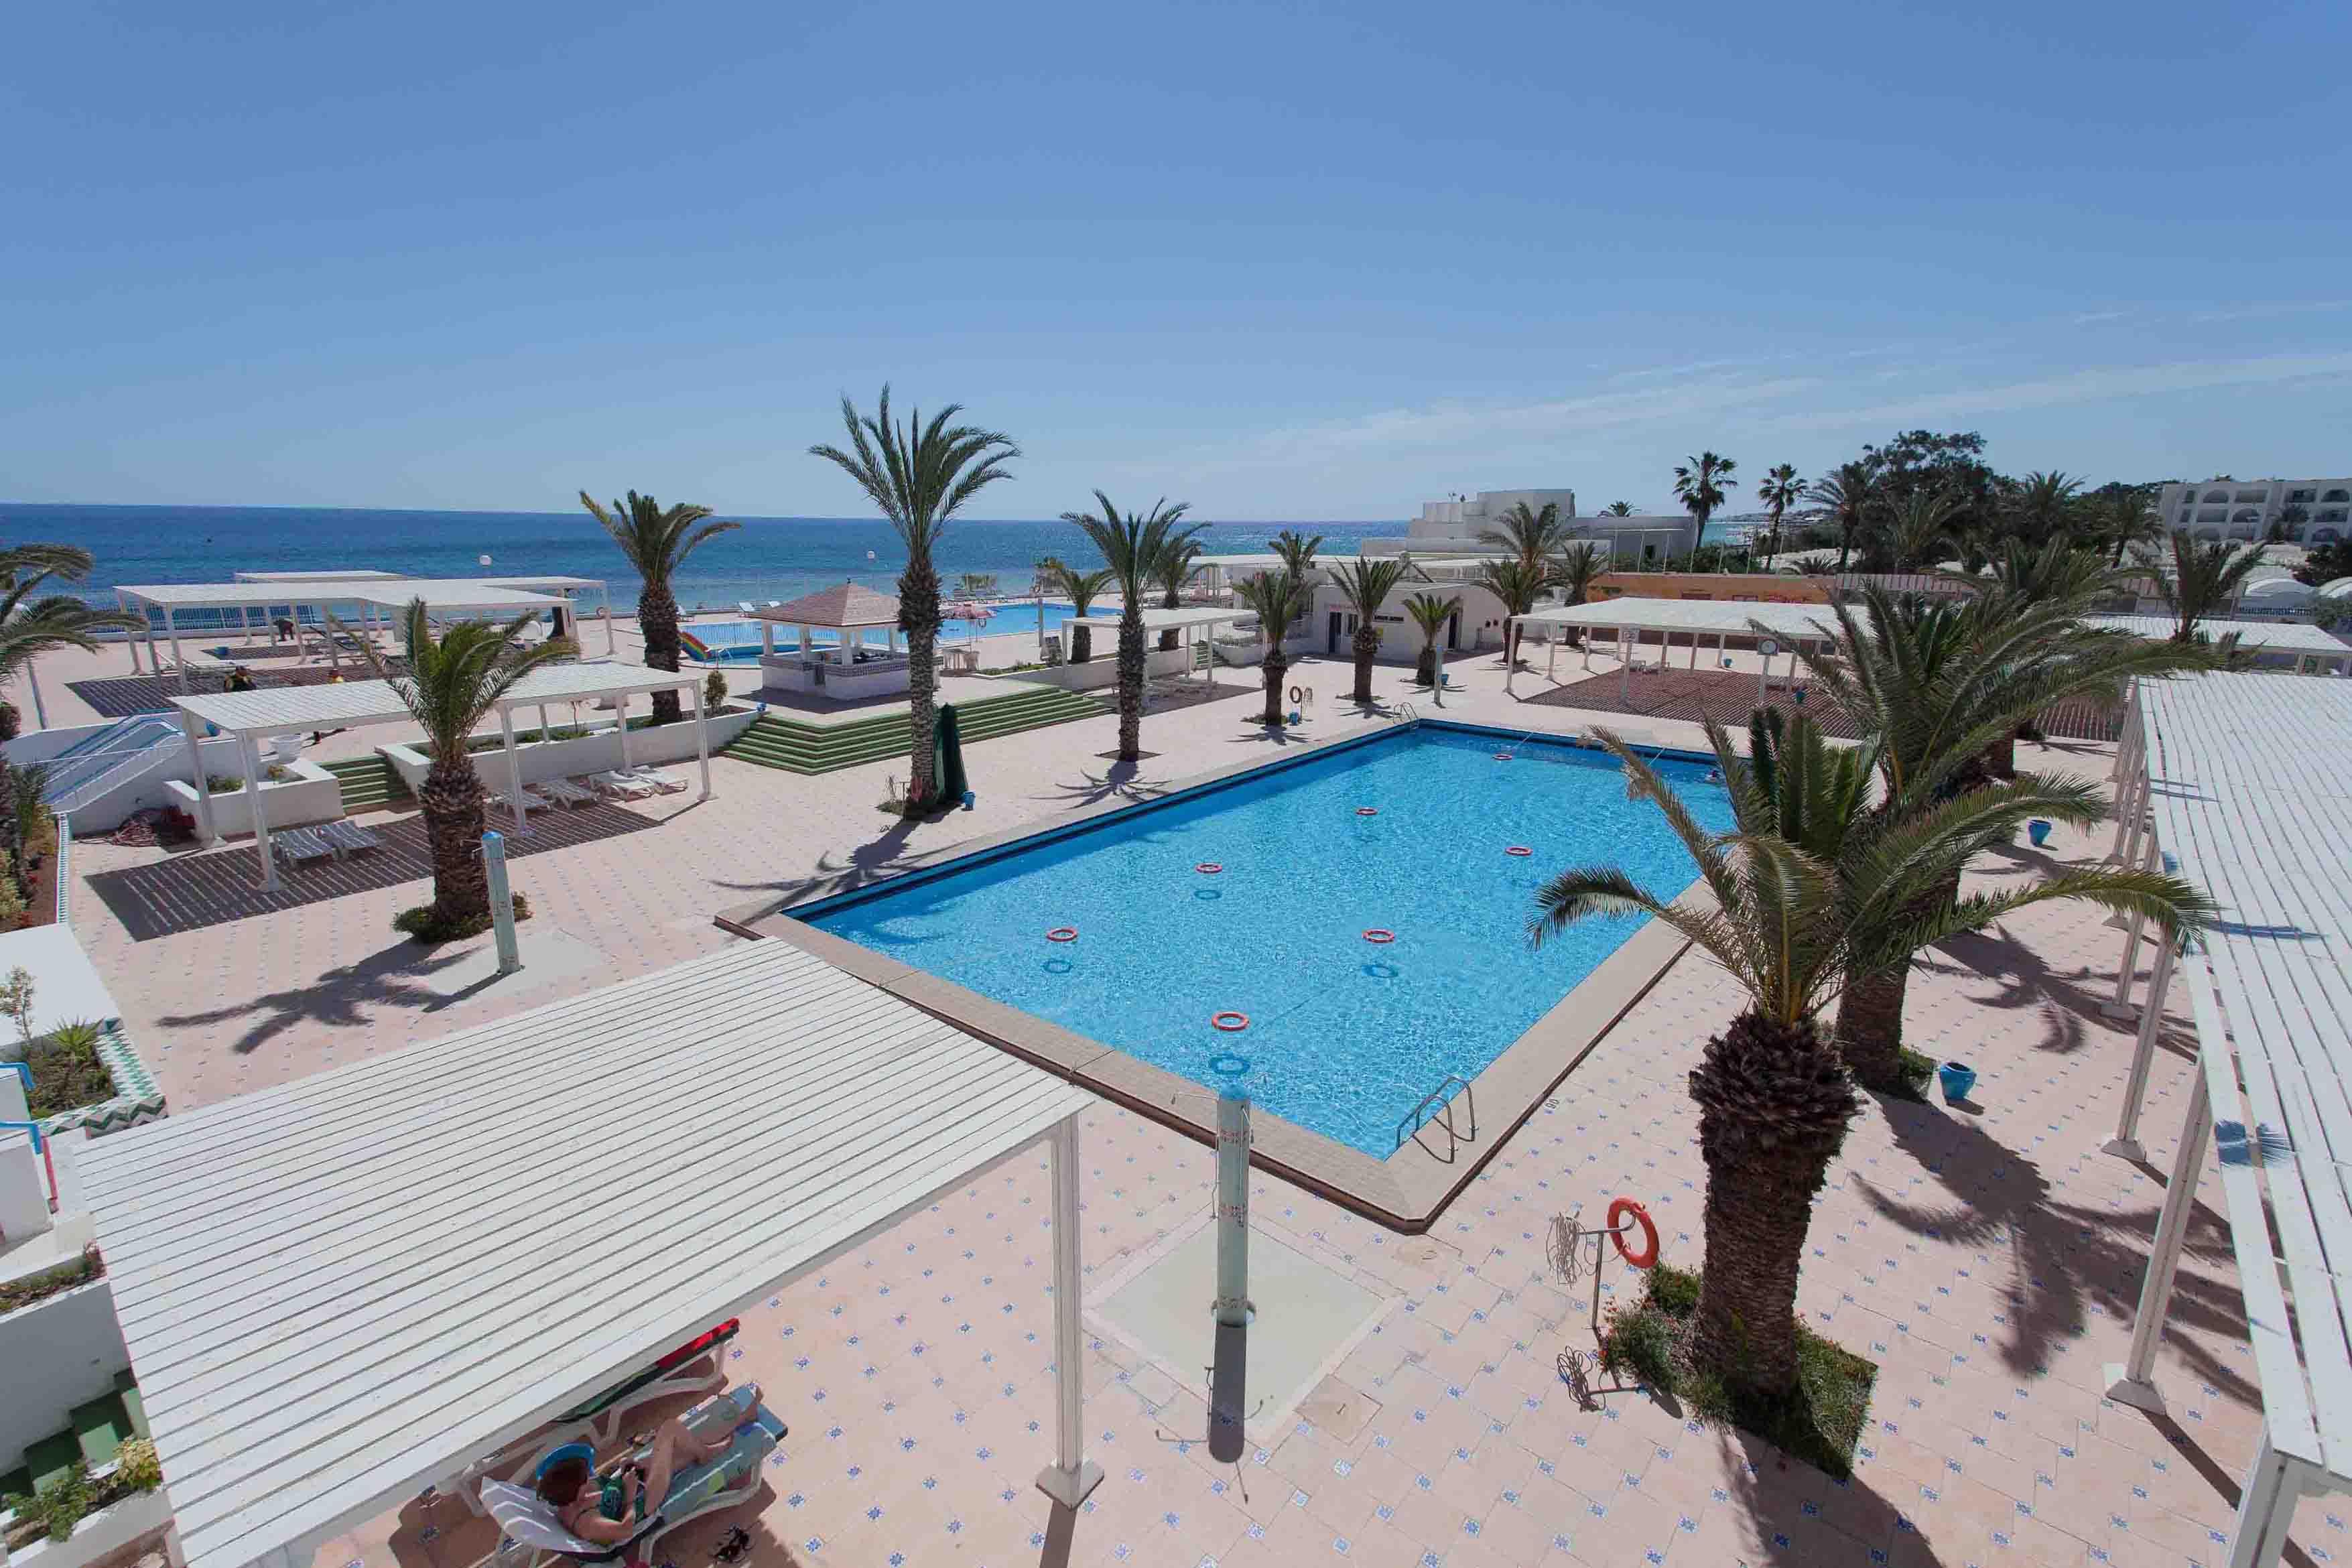 Тунис El Mouradi Club Selima 3* , Порт Эль-Кантауи